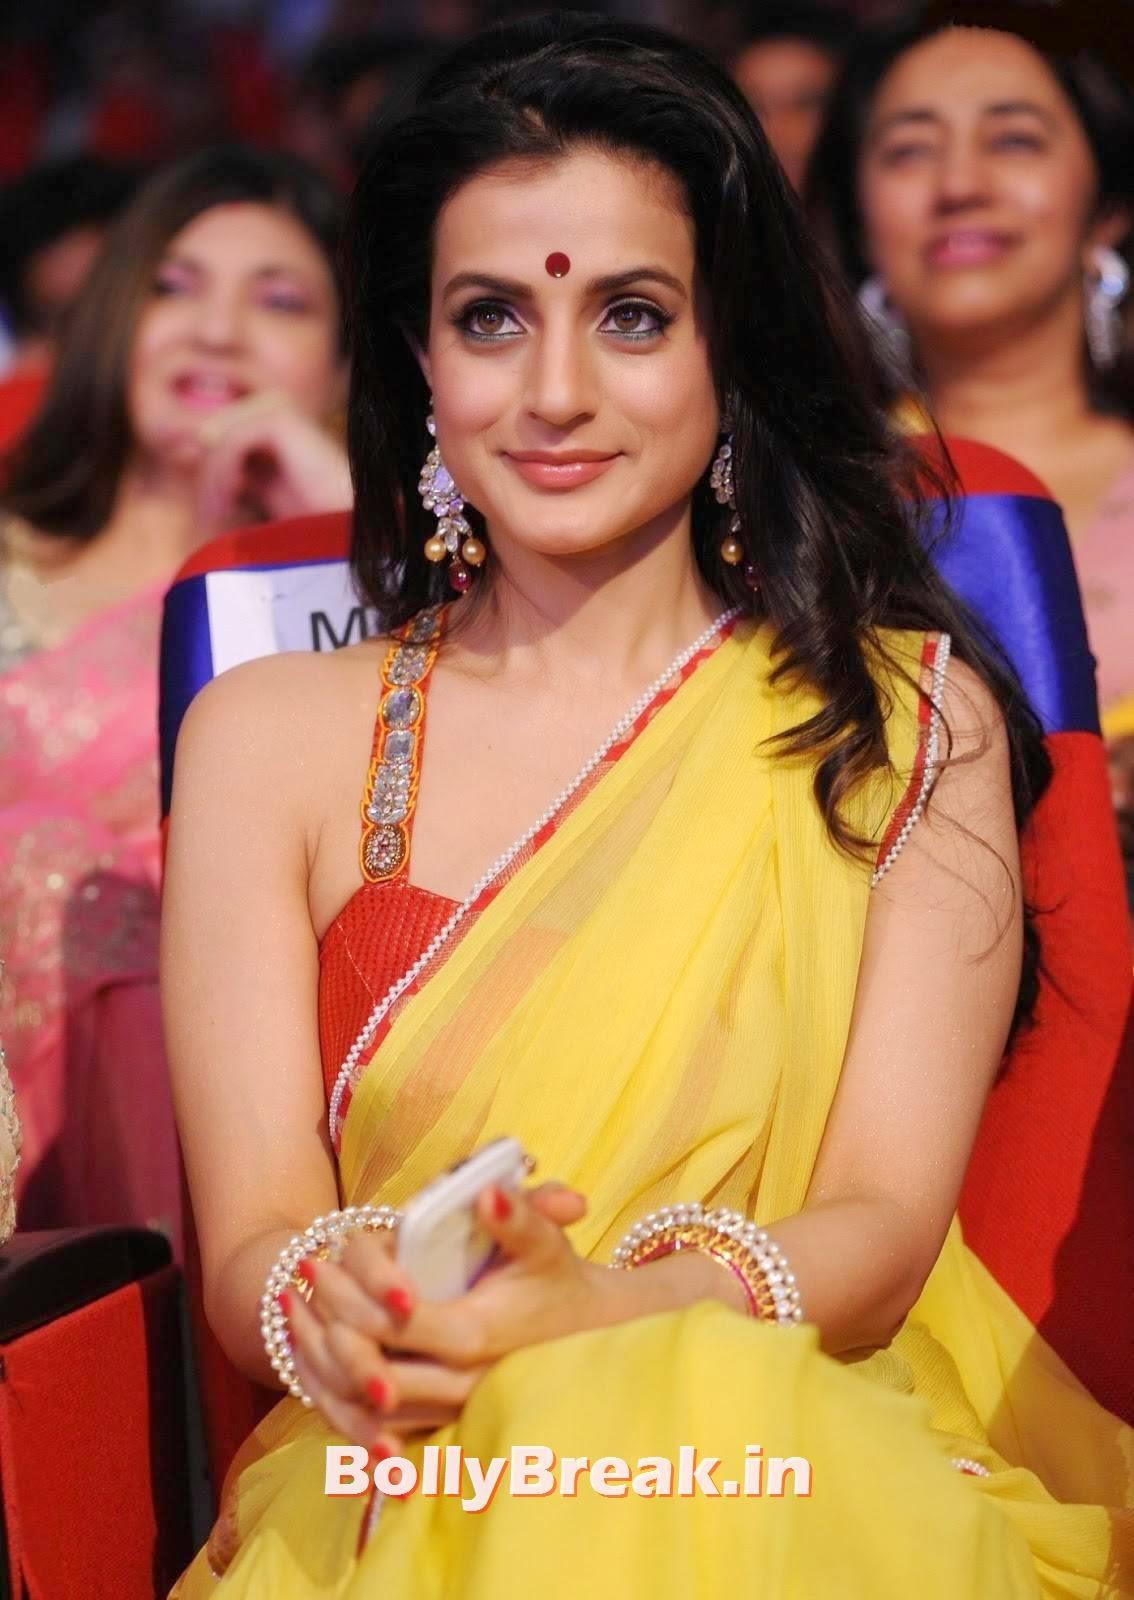 Amisha patel in yellow saree, Amisha Patel Latest hot Photos in Yellow Saree from Event